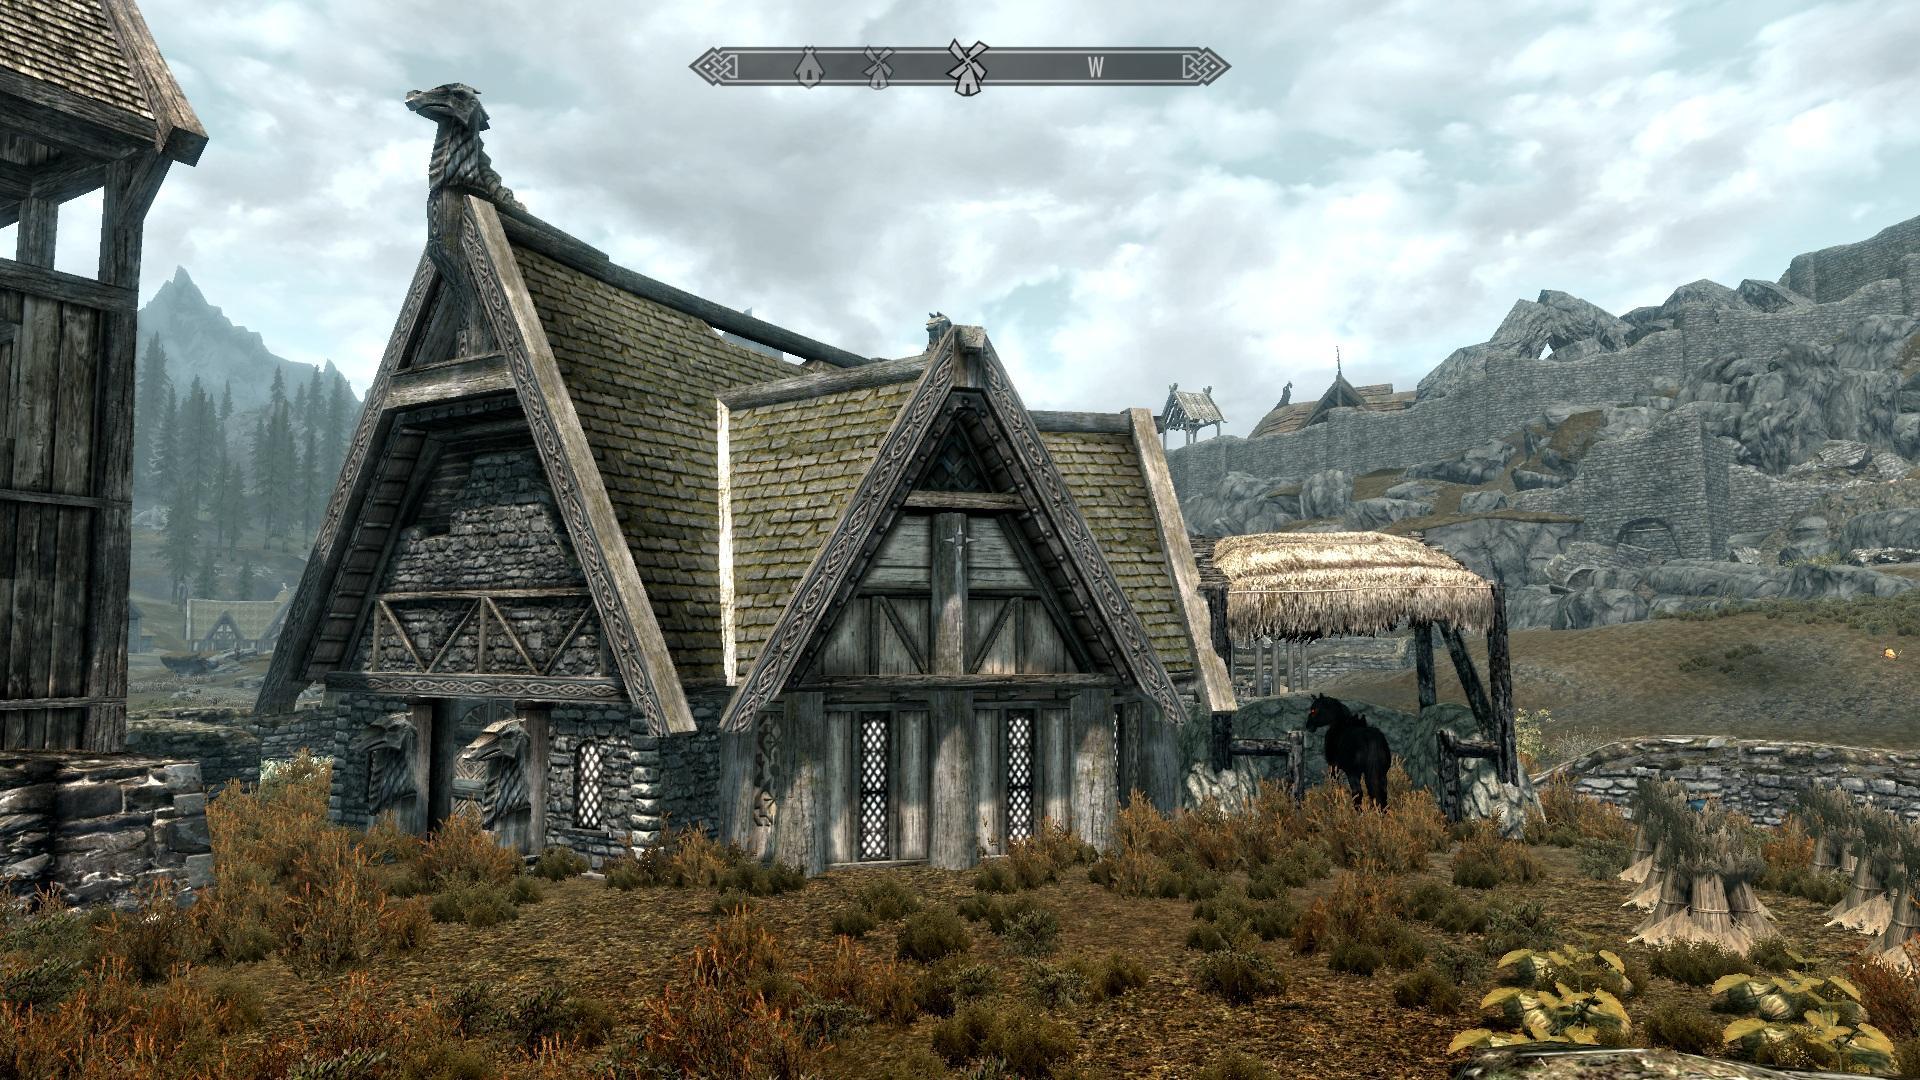 Skyrim, Oblivion, Morrowind - World of lder Scrolls - Skyrim ... size: 1920 x 1080 post ID: 8 File size: 0 B